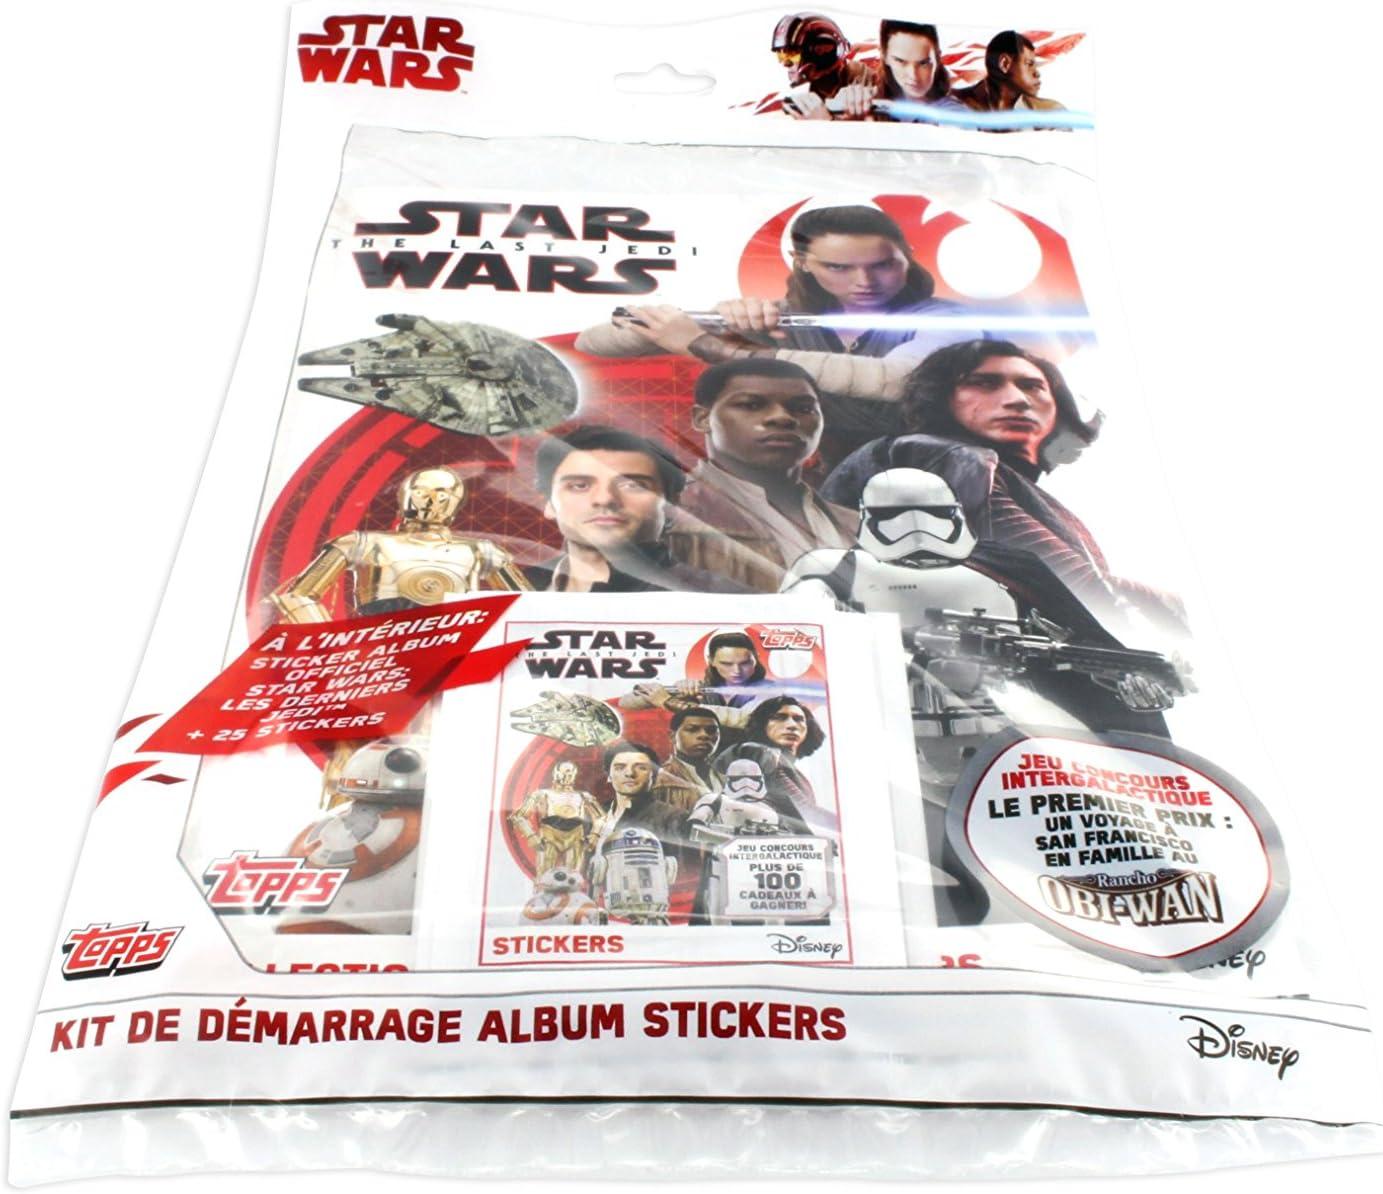 Topps-sticker 4-Star Wars-Les derniers Jedi